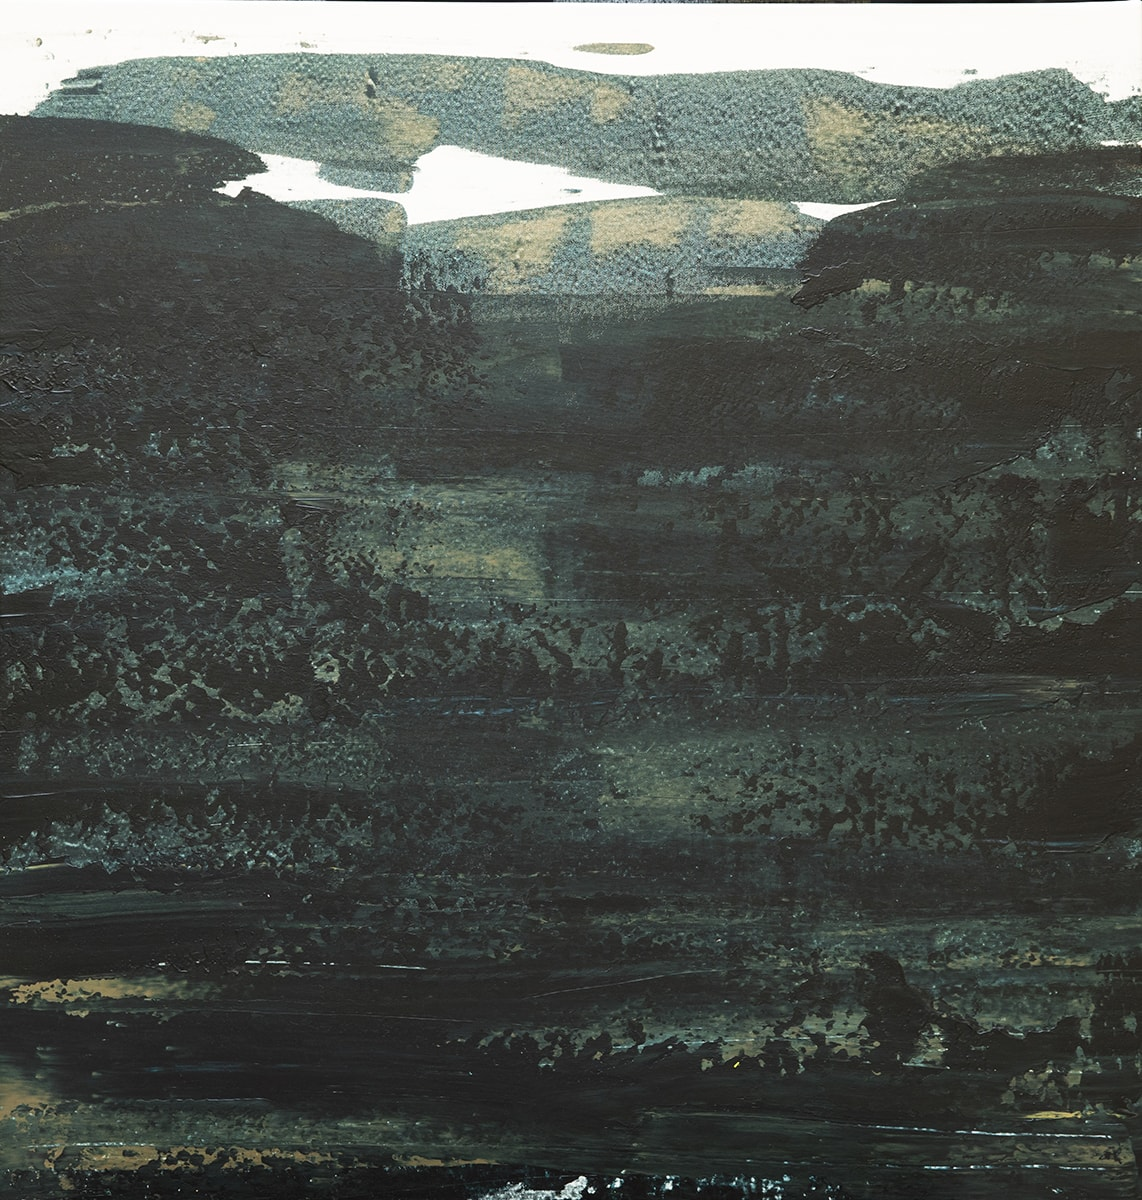 Maria Boström - Black living matter